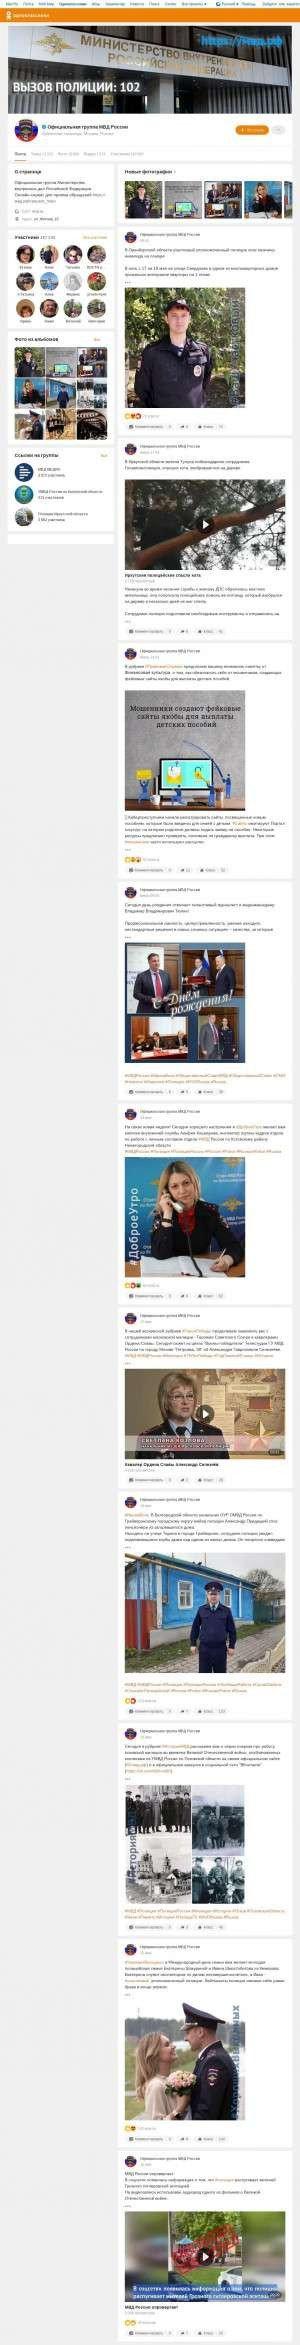 Предпросмотр для www.odnoklassniki.ru — Отдел МВД России по Арскому району